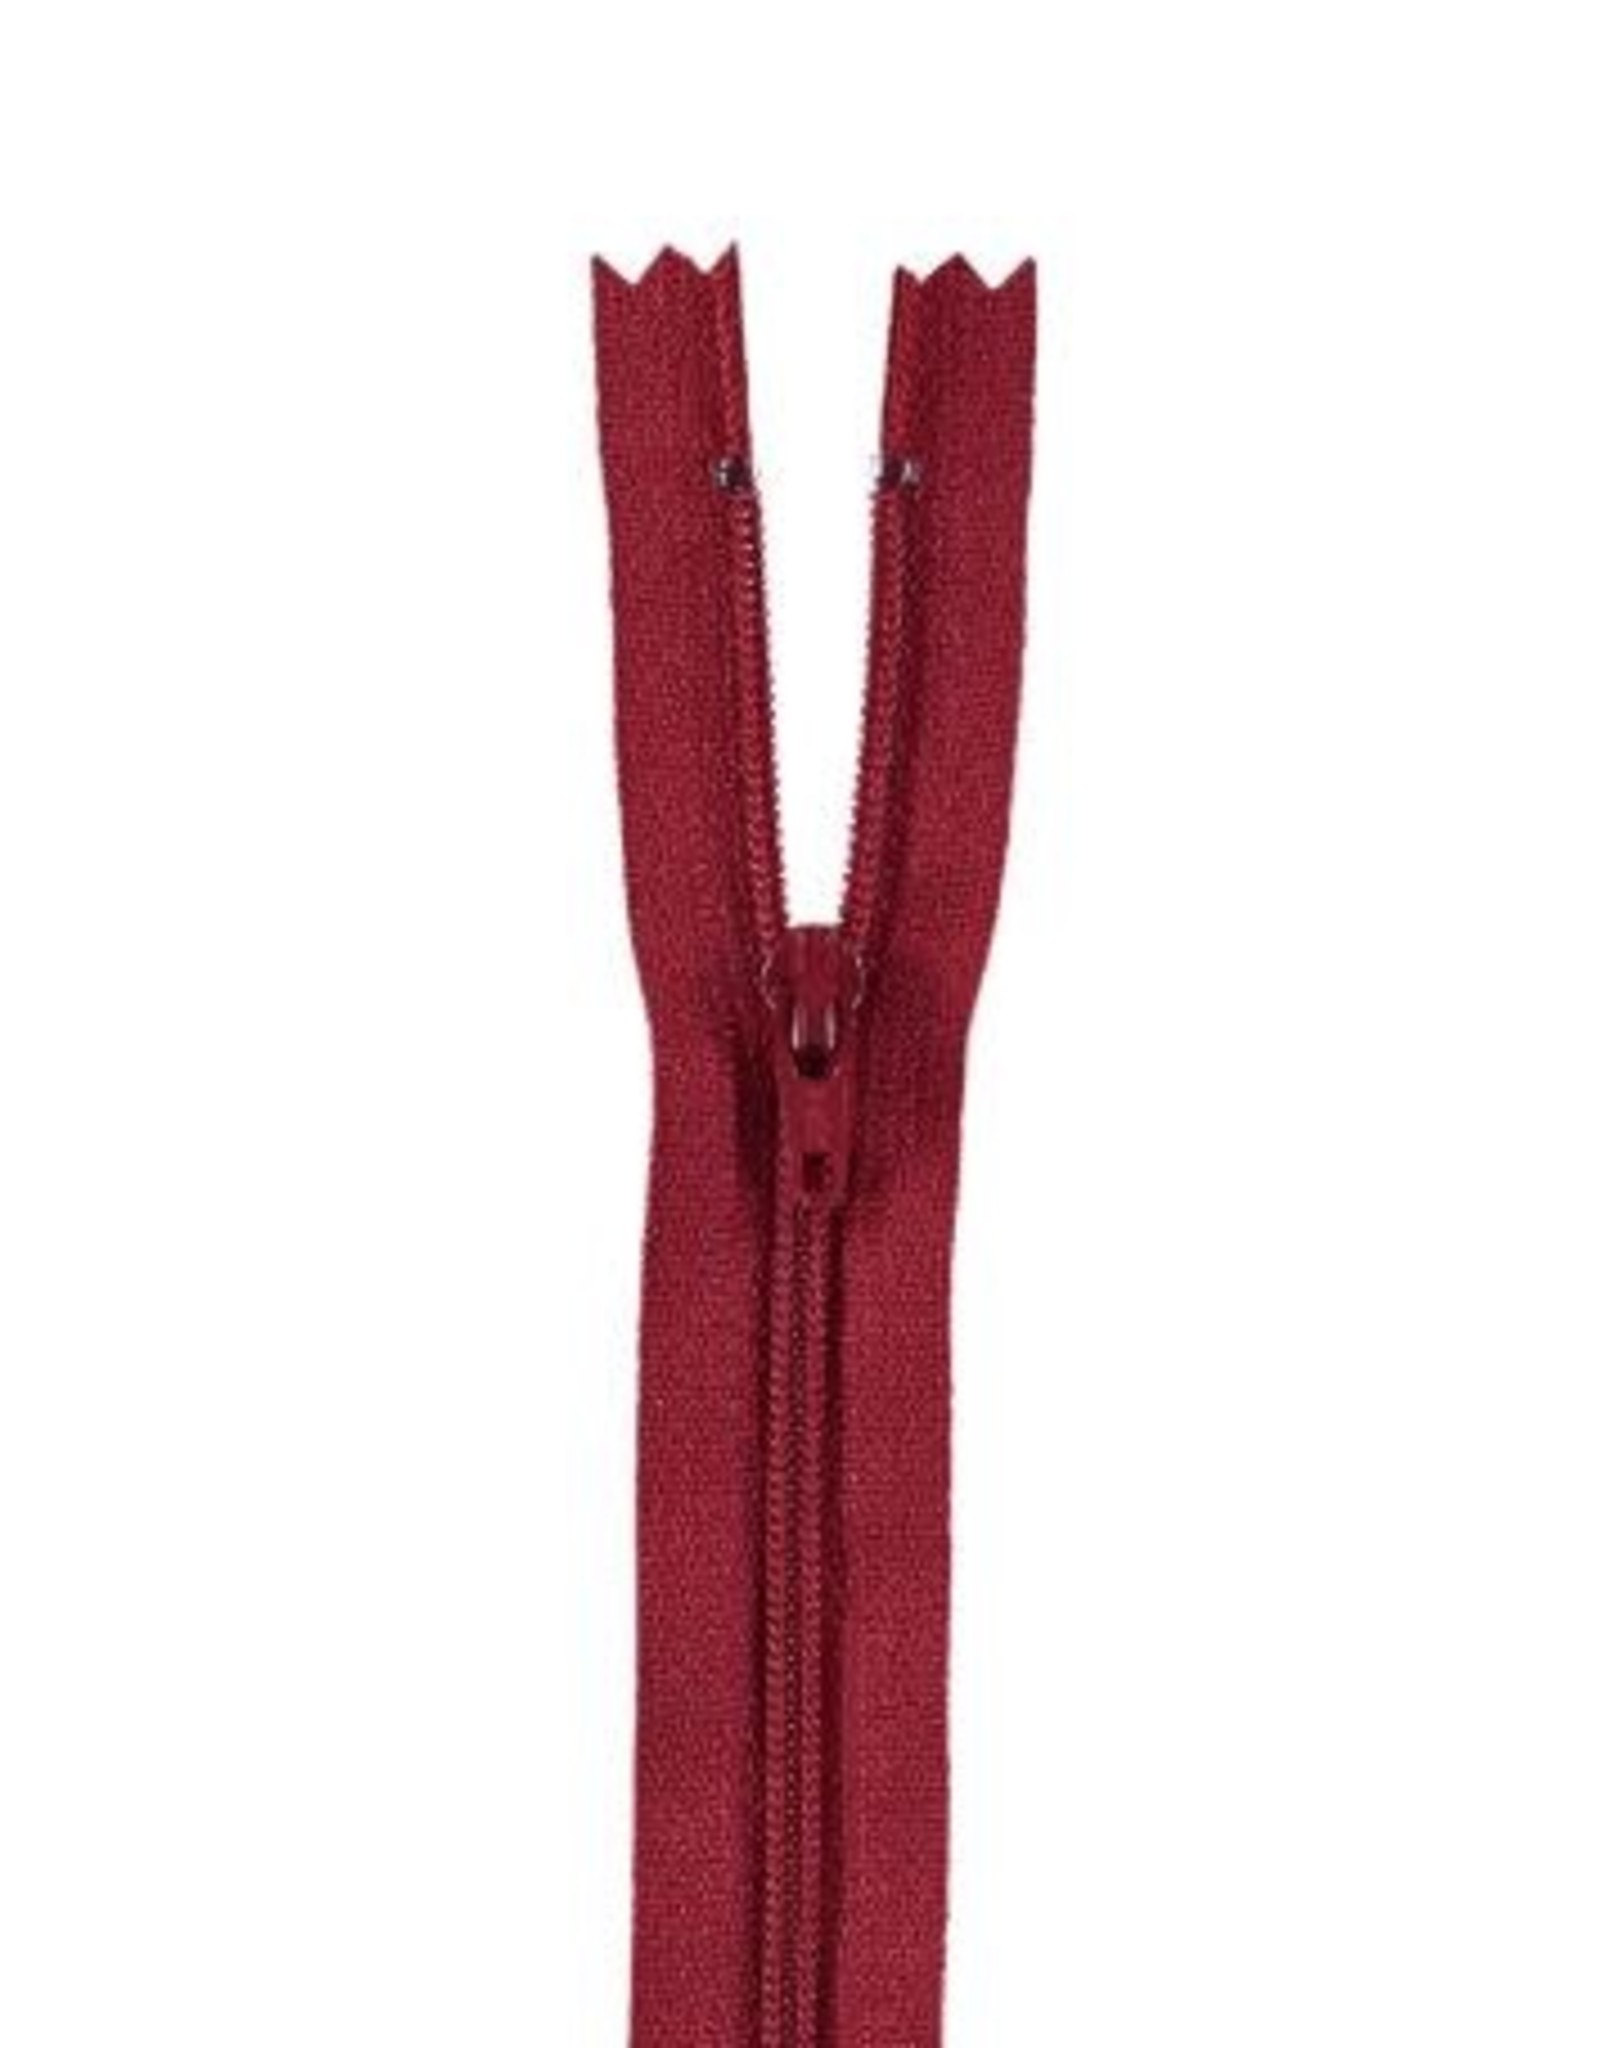 YKK Spiraalrits niet-DB 3mm donker rood 520-45cm